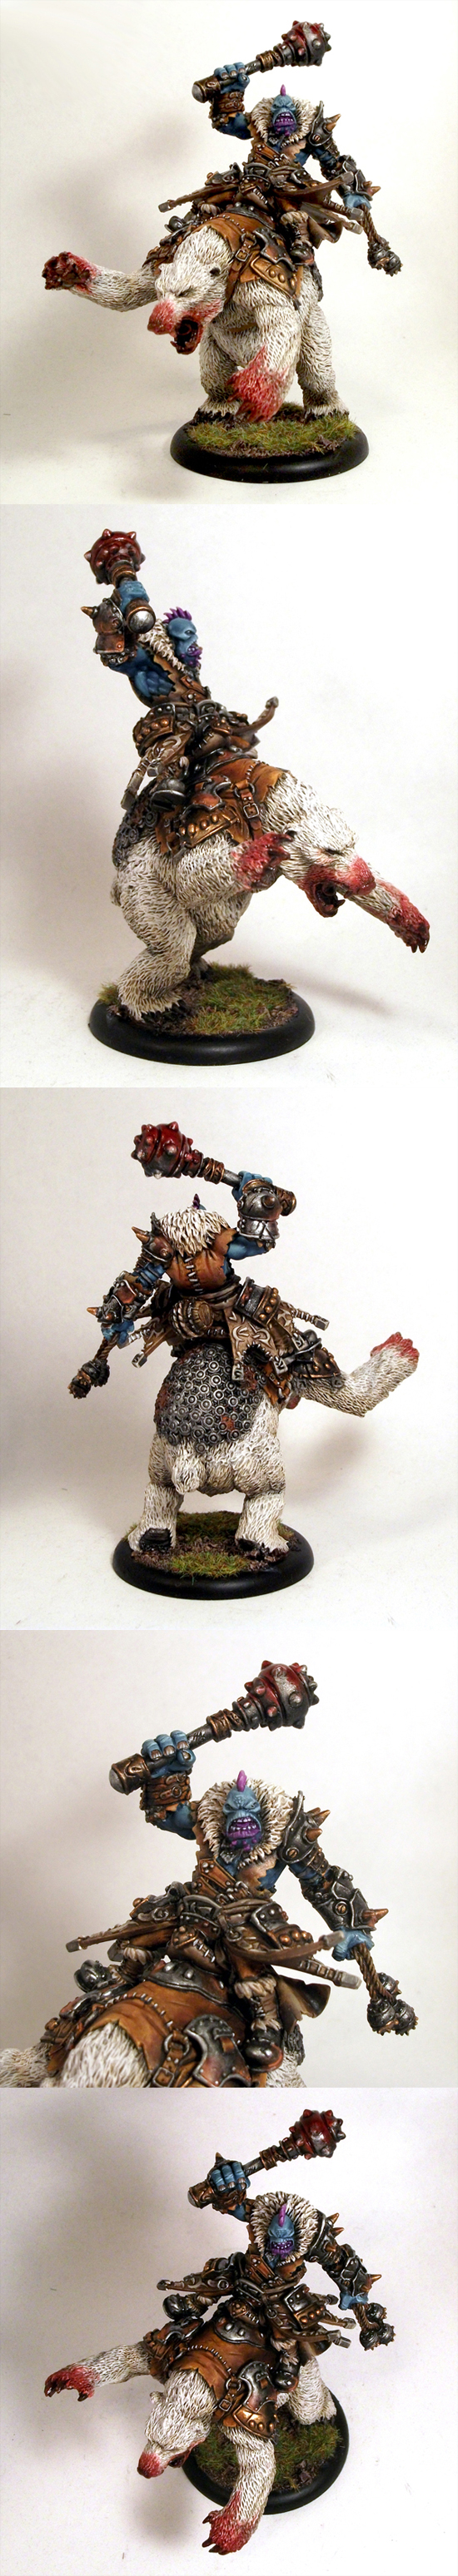 Epic Borka Trollbloods Warlock